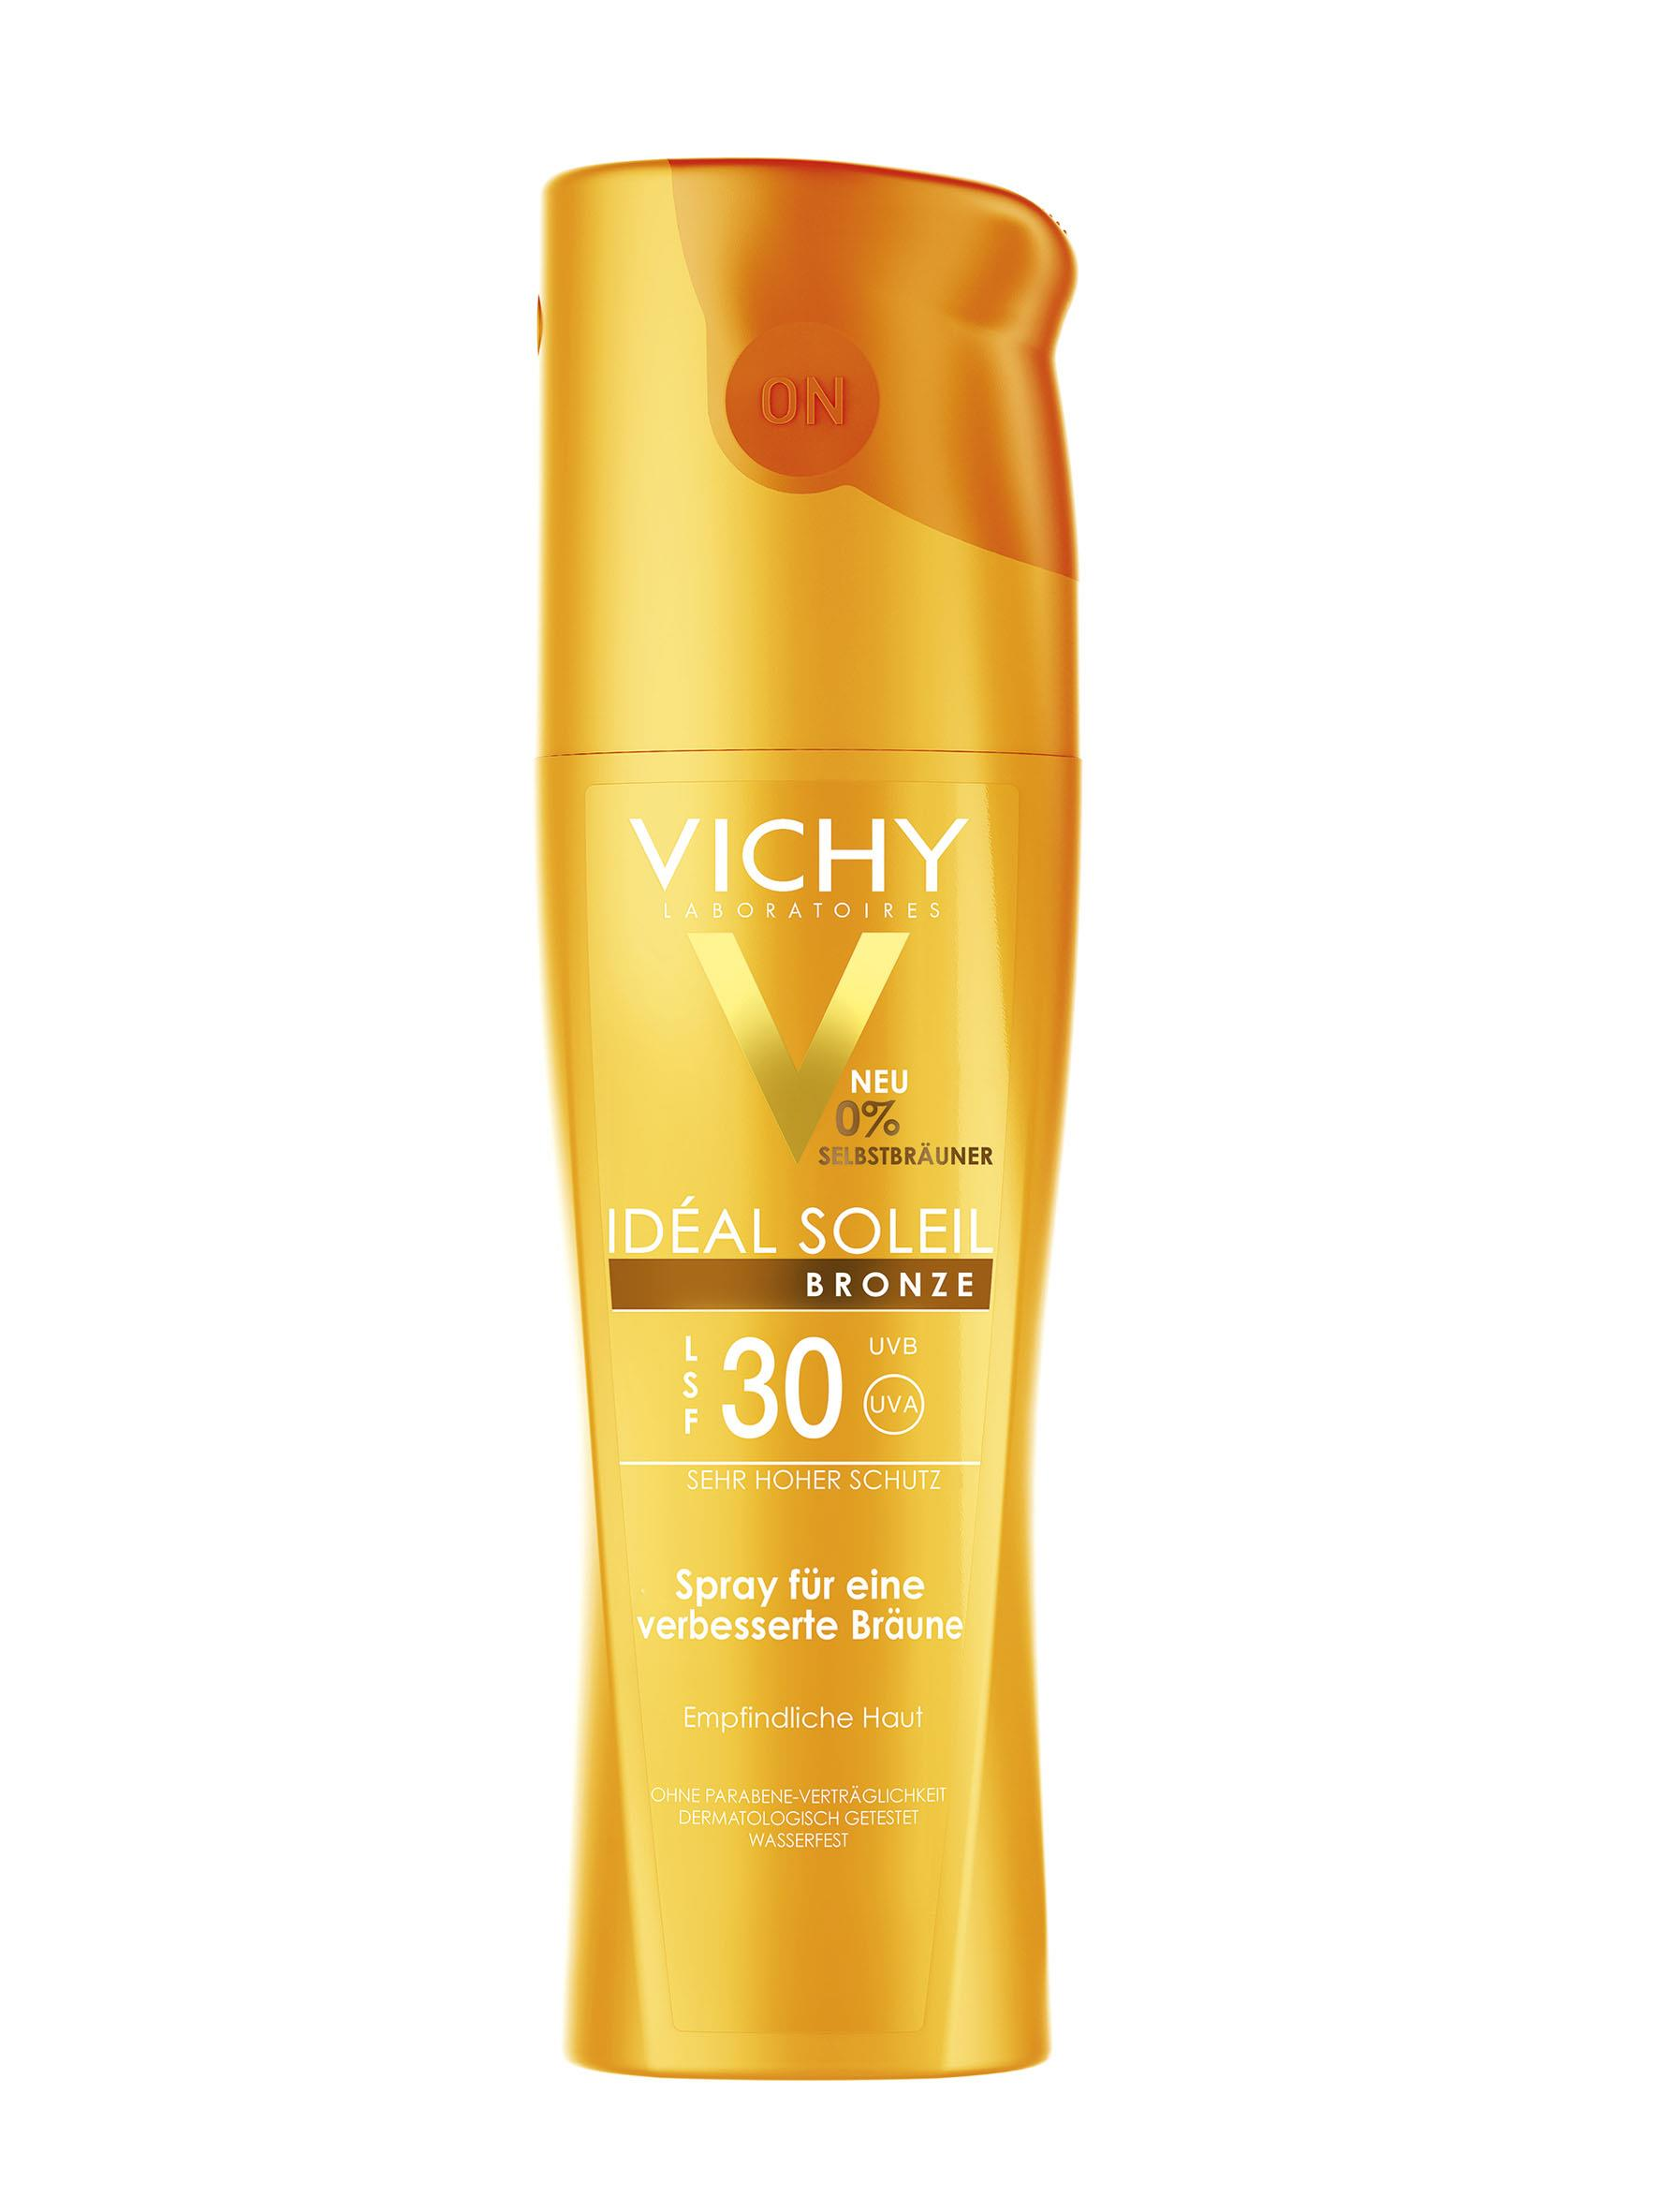 VICHY Ideal Soleil Bronze Spray LSF 30